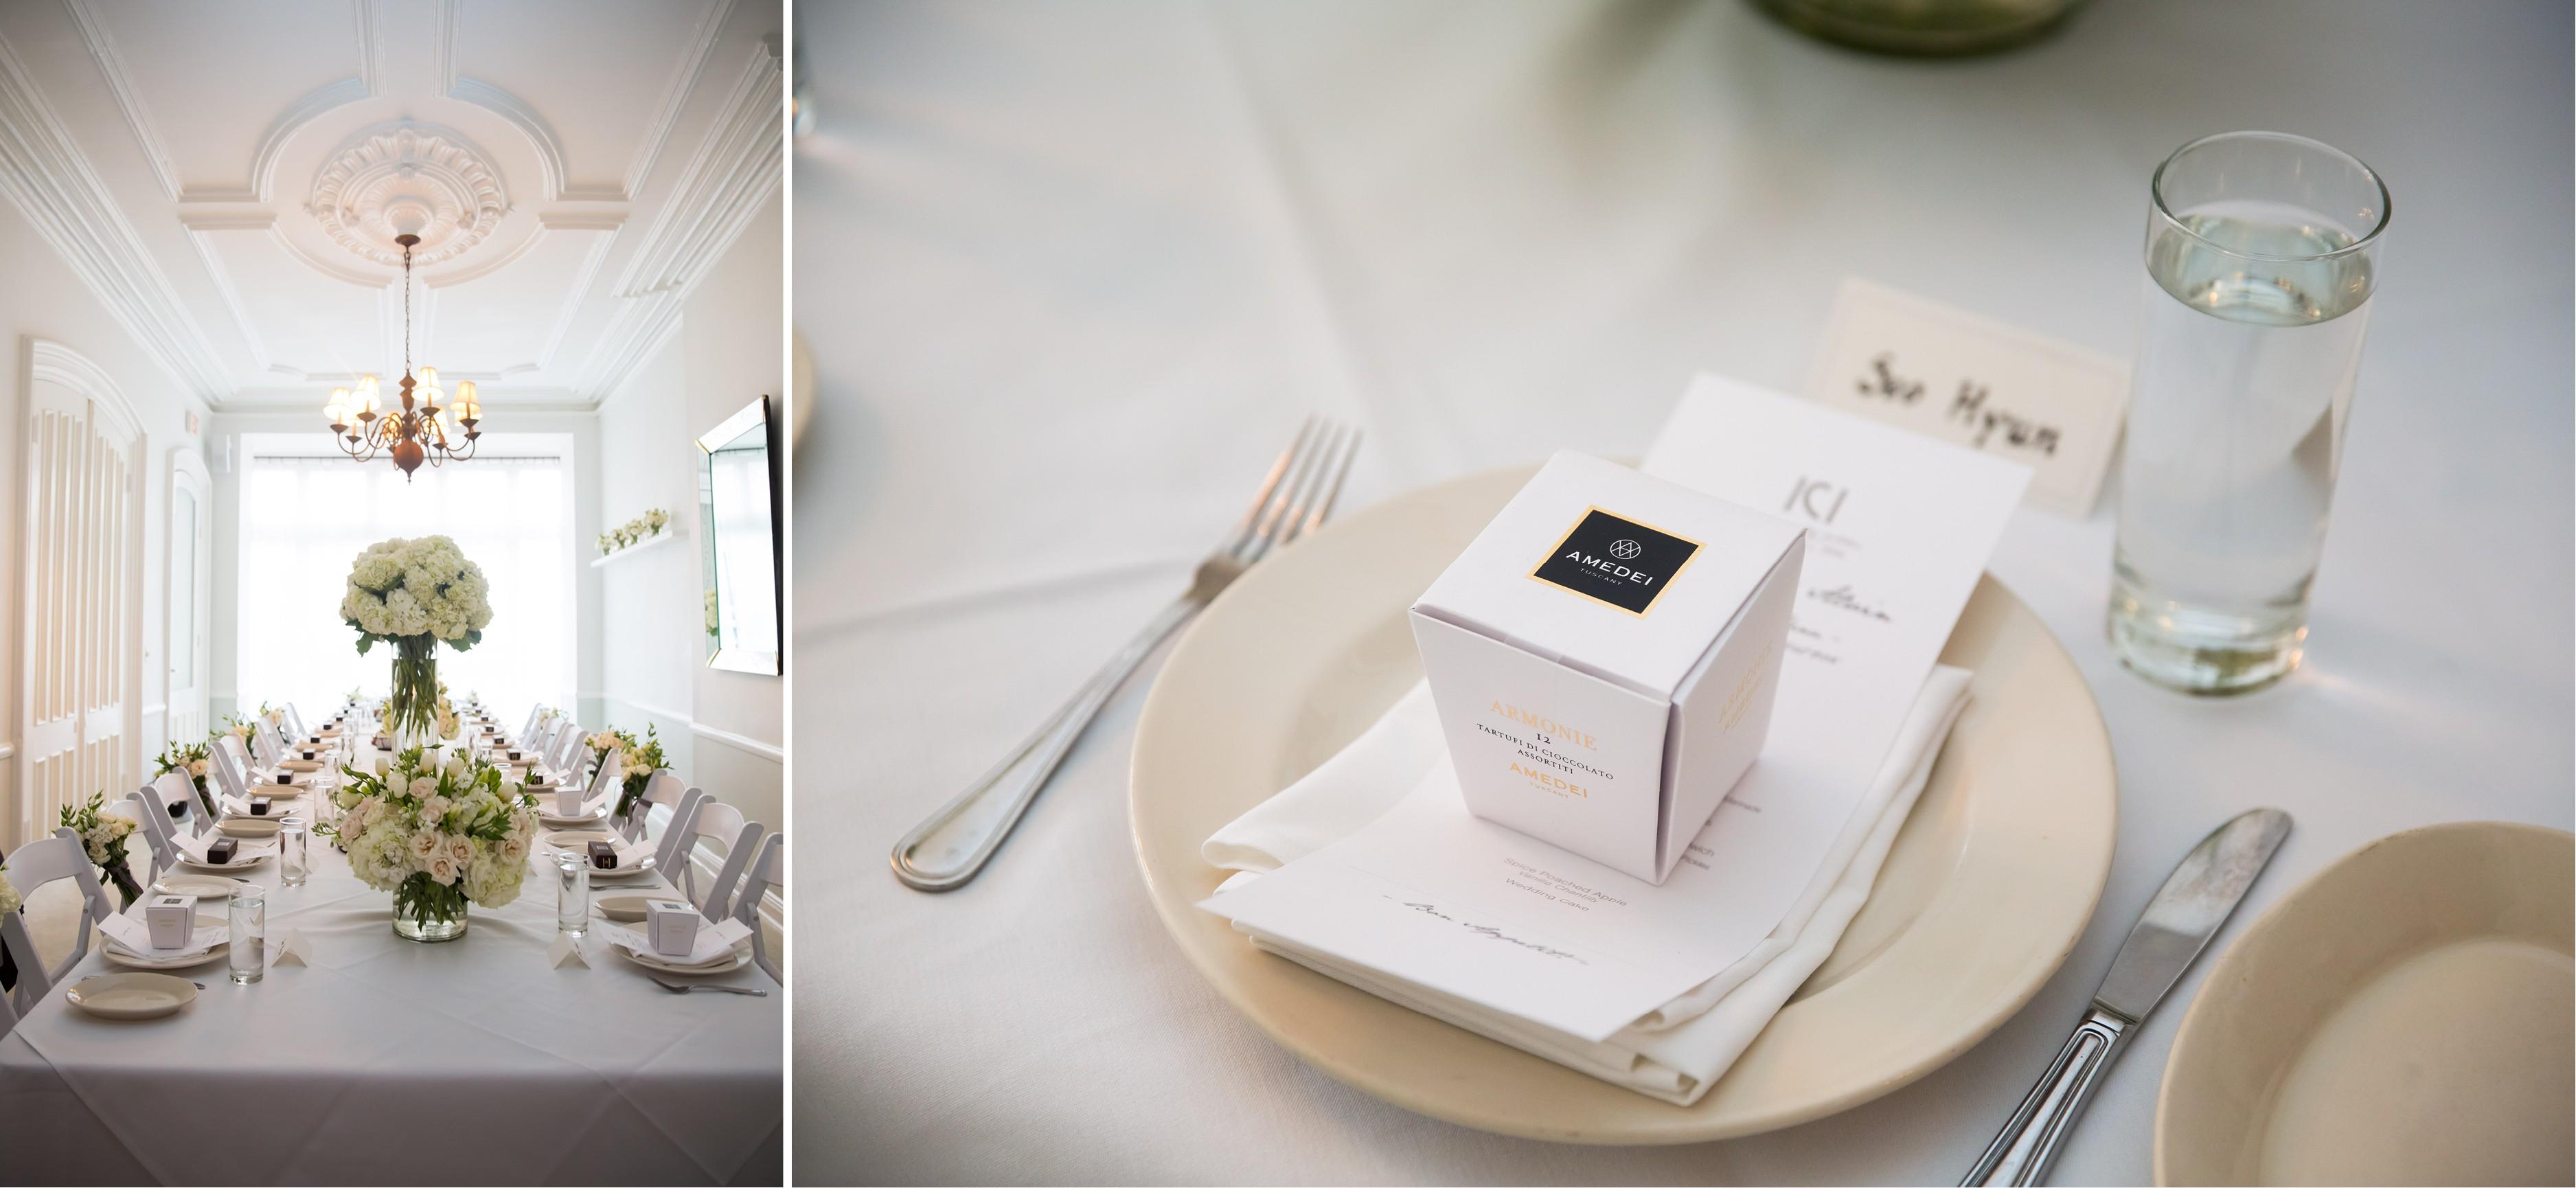 Emma_cleary_photography ici wedding15